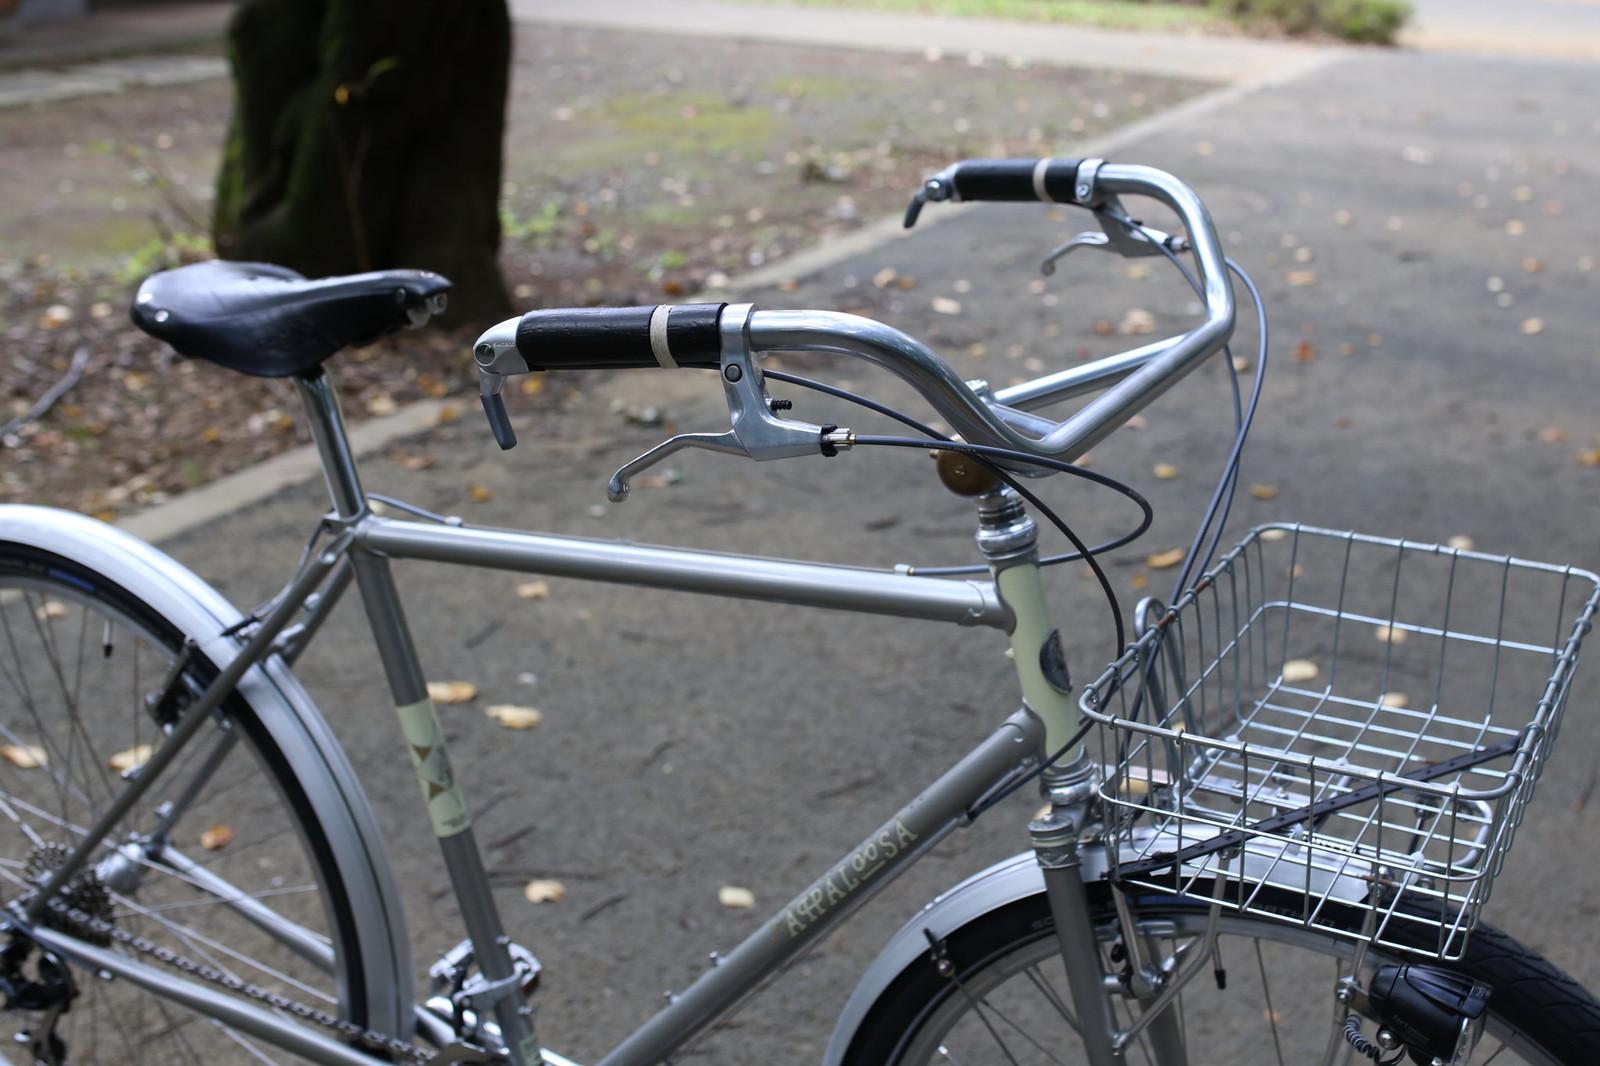 *RIVENDELL* joe appaloosa complete bike